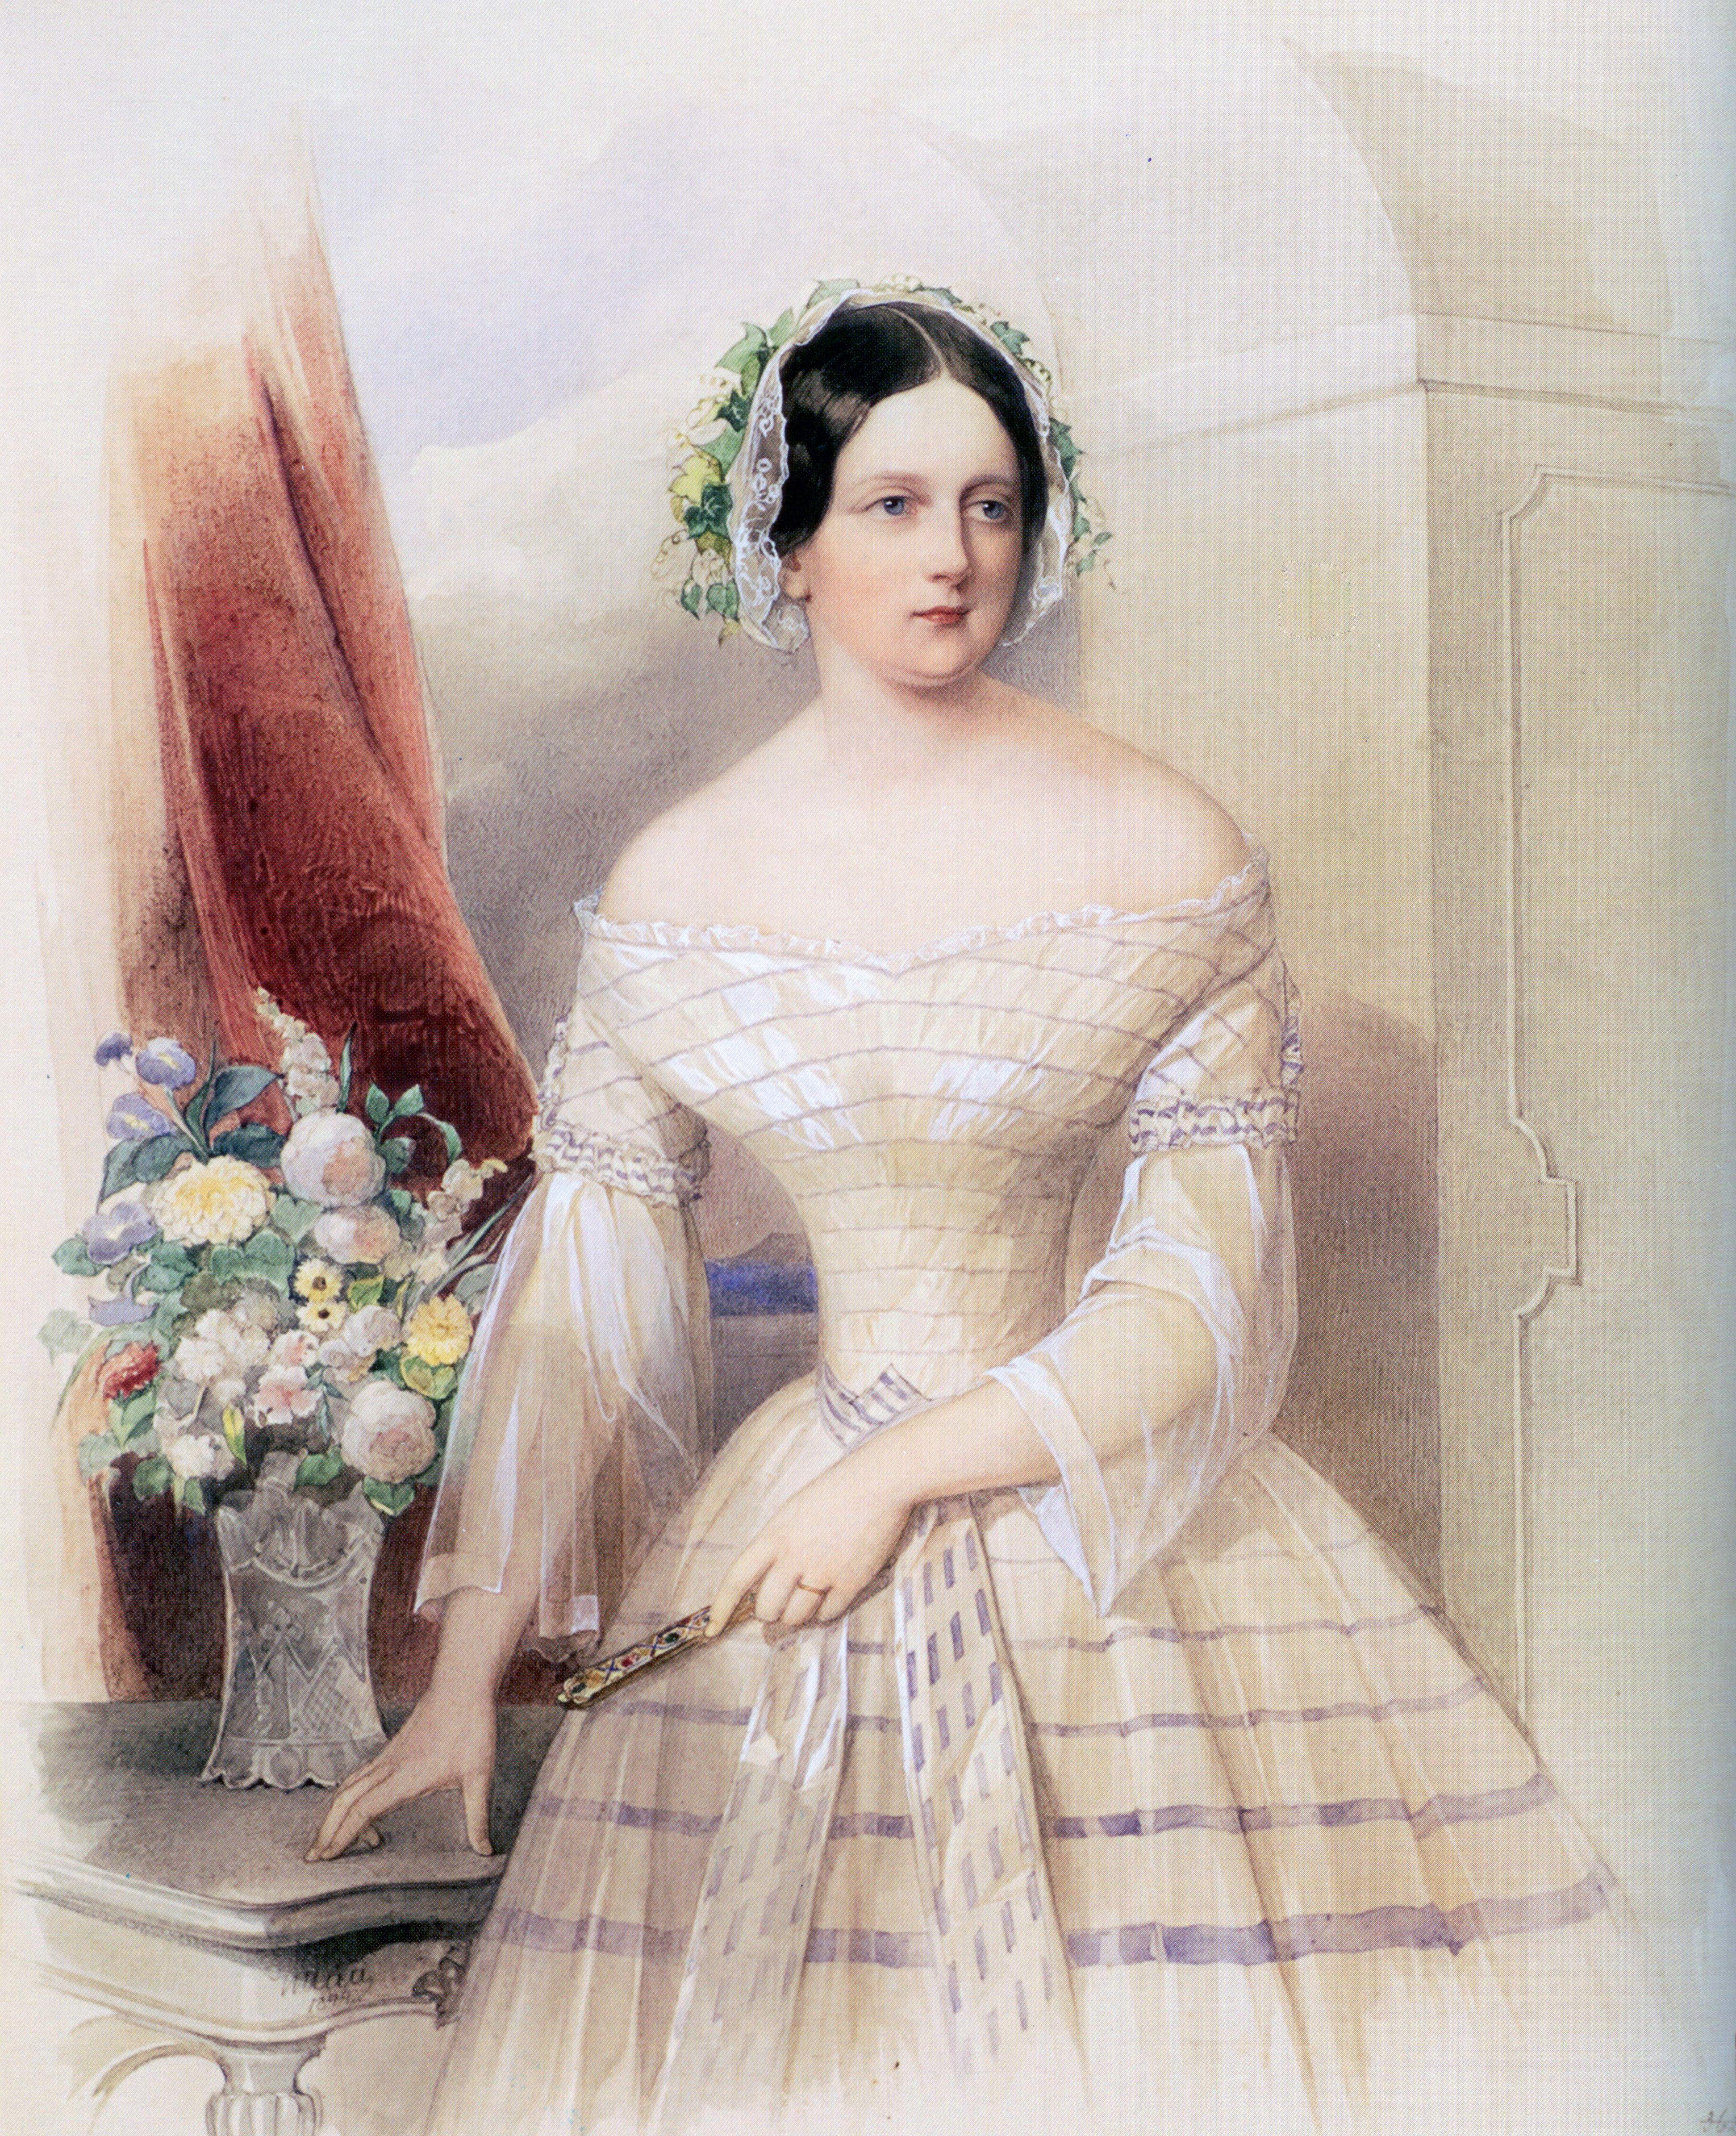 http://upload.wikimedia.org/wikipedia/commons/a/a5/Elizabeth_Mikhailovna_by_Hau.jpg?uselang=ru